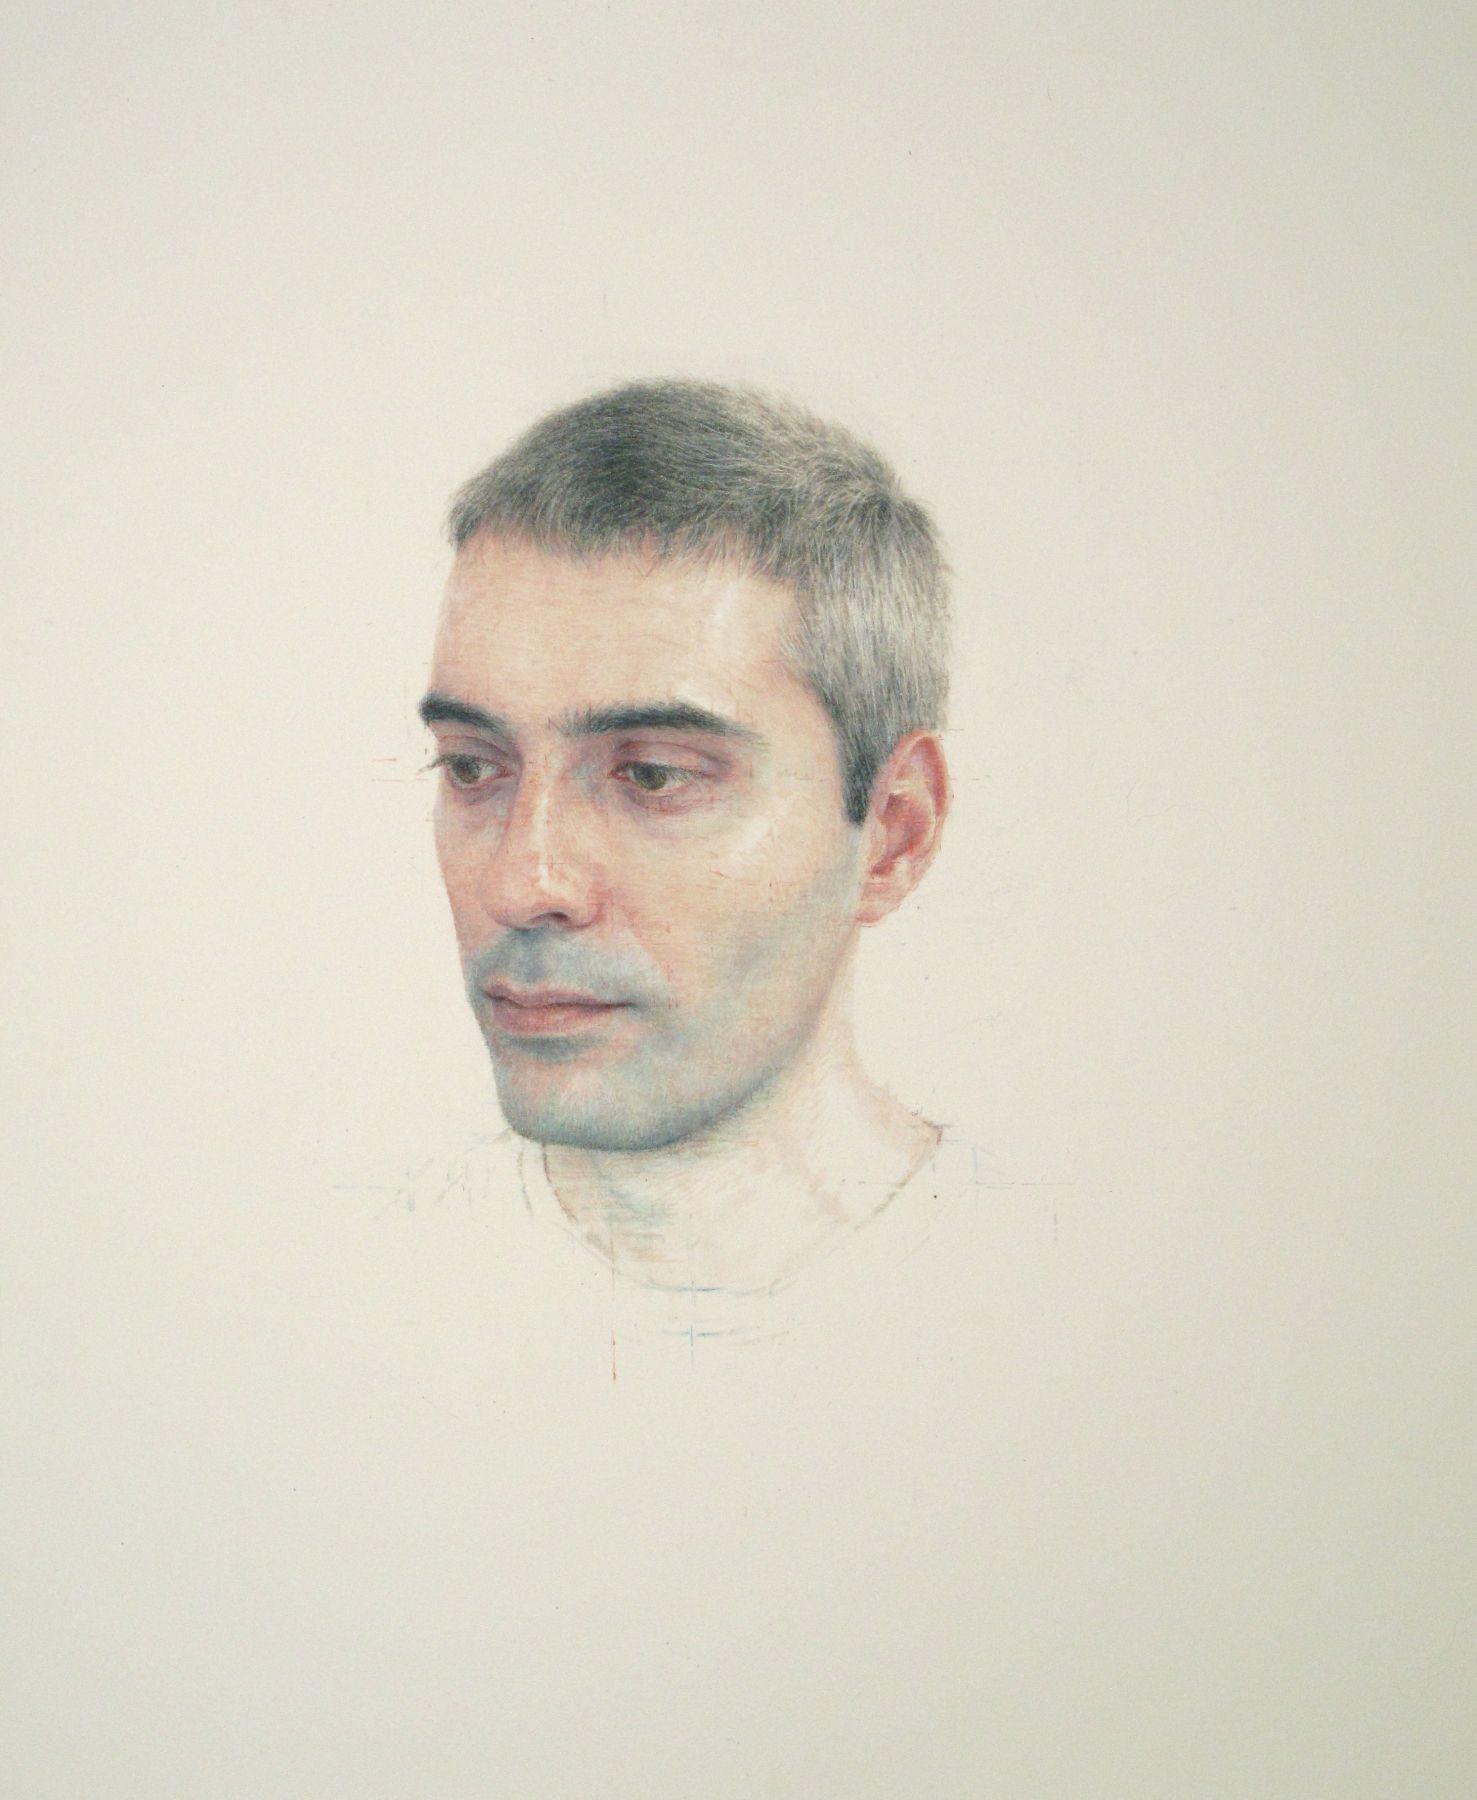 Robert Bauer, Joan Martinez Cuerva (SOLD), 2013, tempera on paper, 12 1/4 x 10 inches